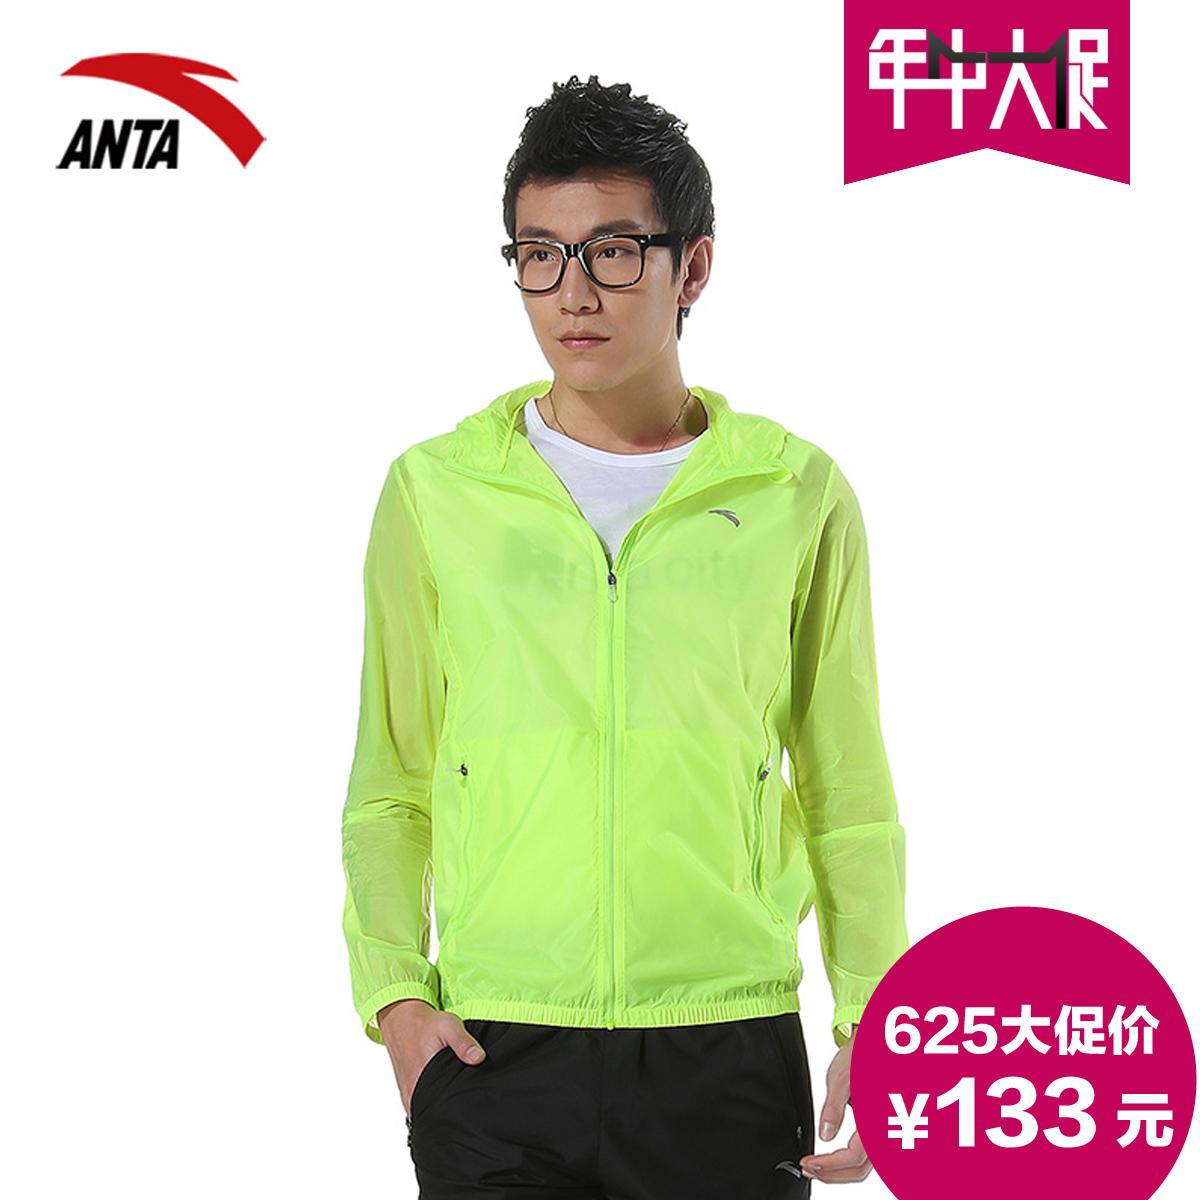 Спортивная куртка Anta 2015 95515645